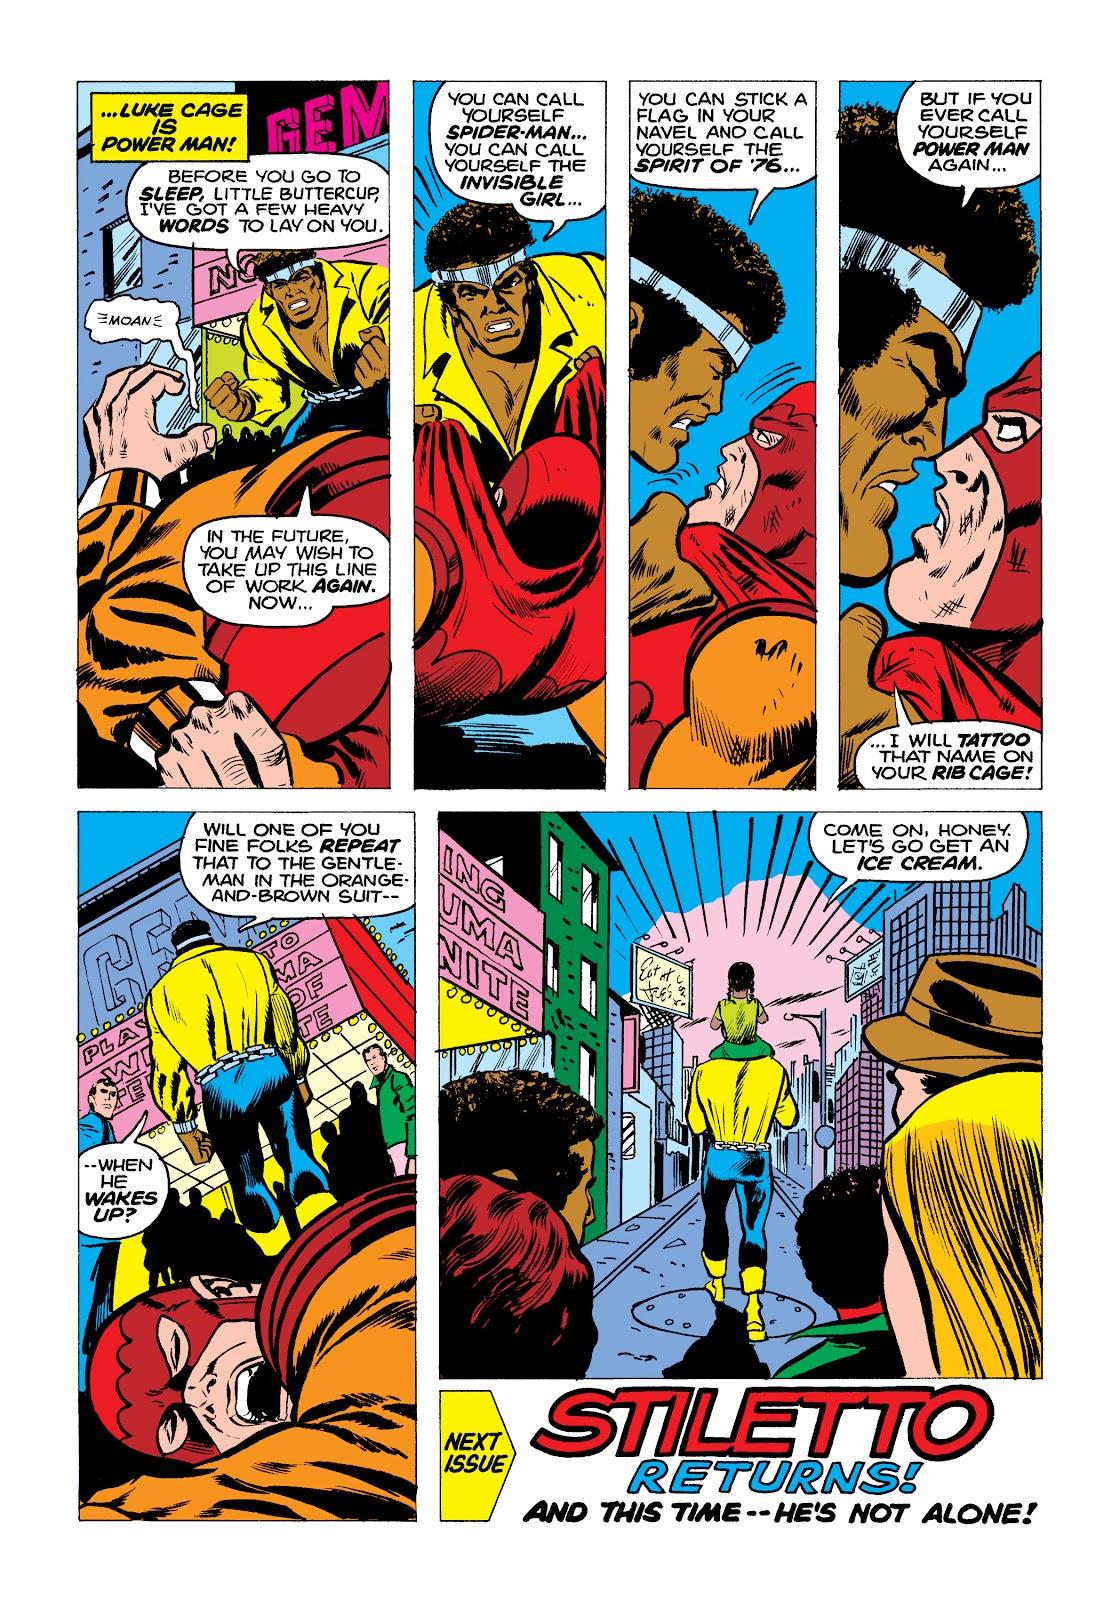 Read online Marvel Masterworks: Luke Cage, Power Man comic -  Issue # TPB 2 (Part 2) - 5